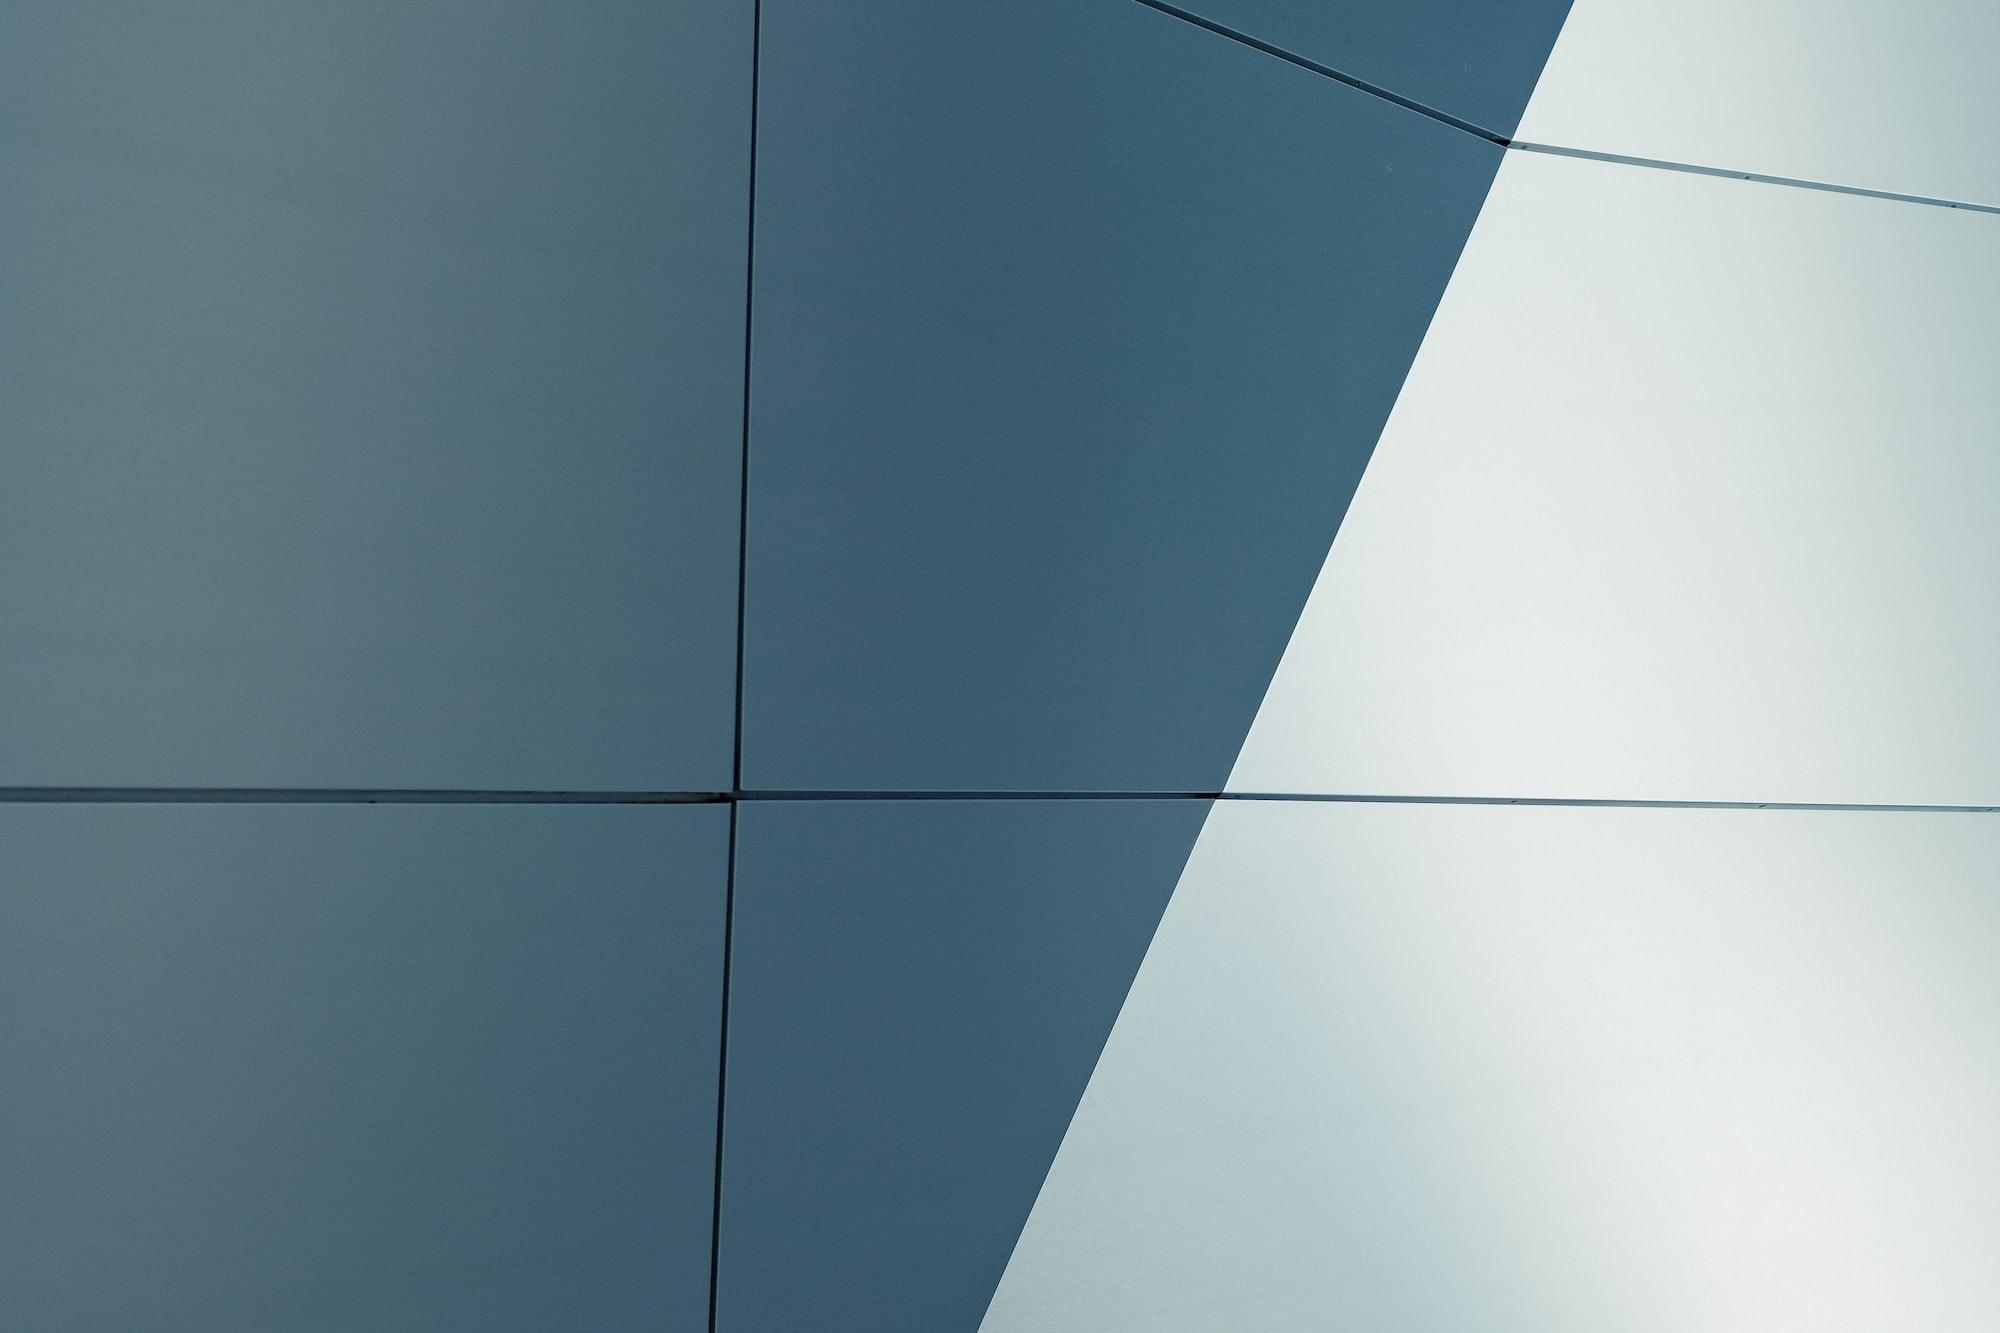 AE Grid Series: Responsive Grids